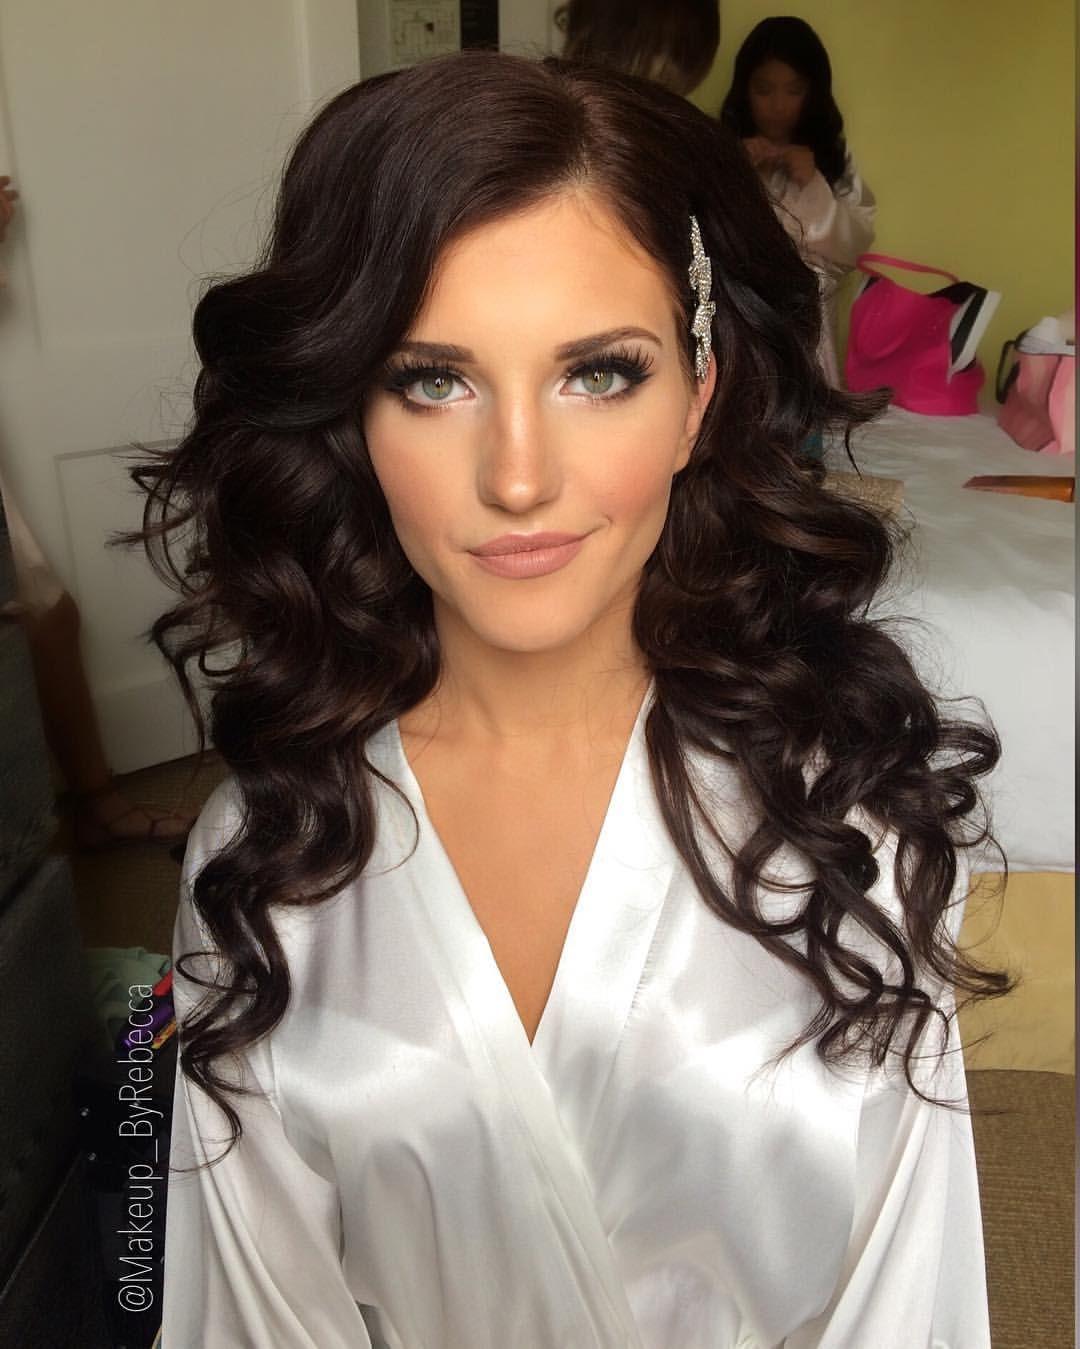 2 281 Likes 53 Comments Makeup Byrebecca Rebecca Bogdan On Instagram Flawless Olga Hairan Wedding Hair And Makeup Prom Hair Bridal Make Up Inspiration